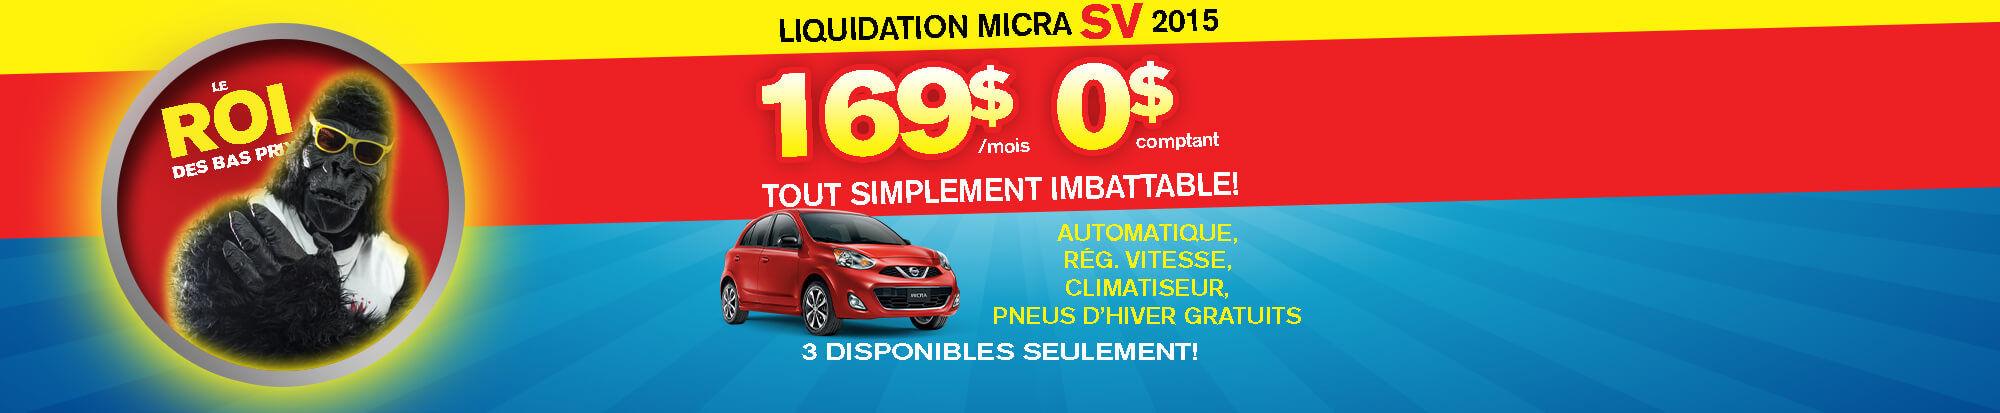 MIcra SV